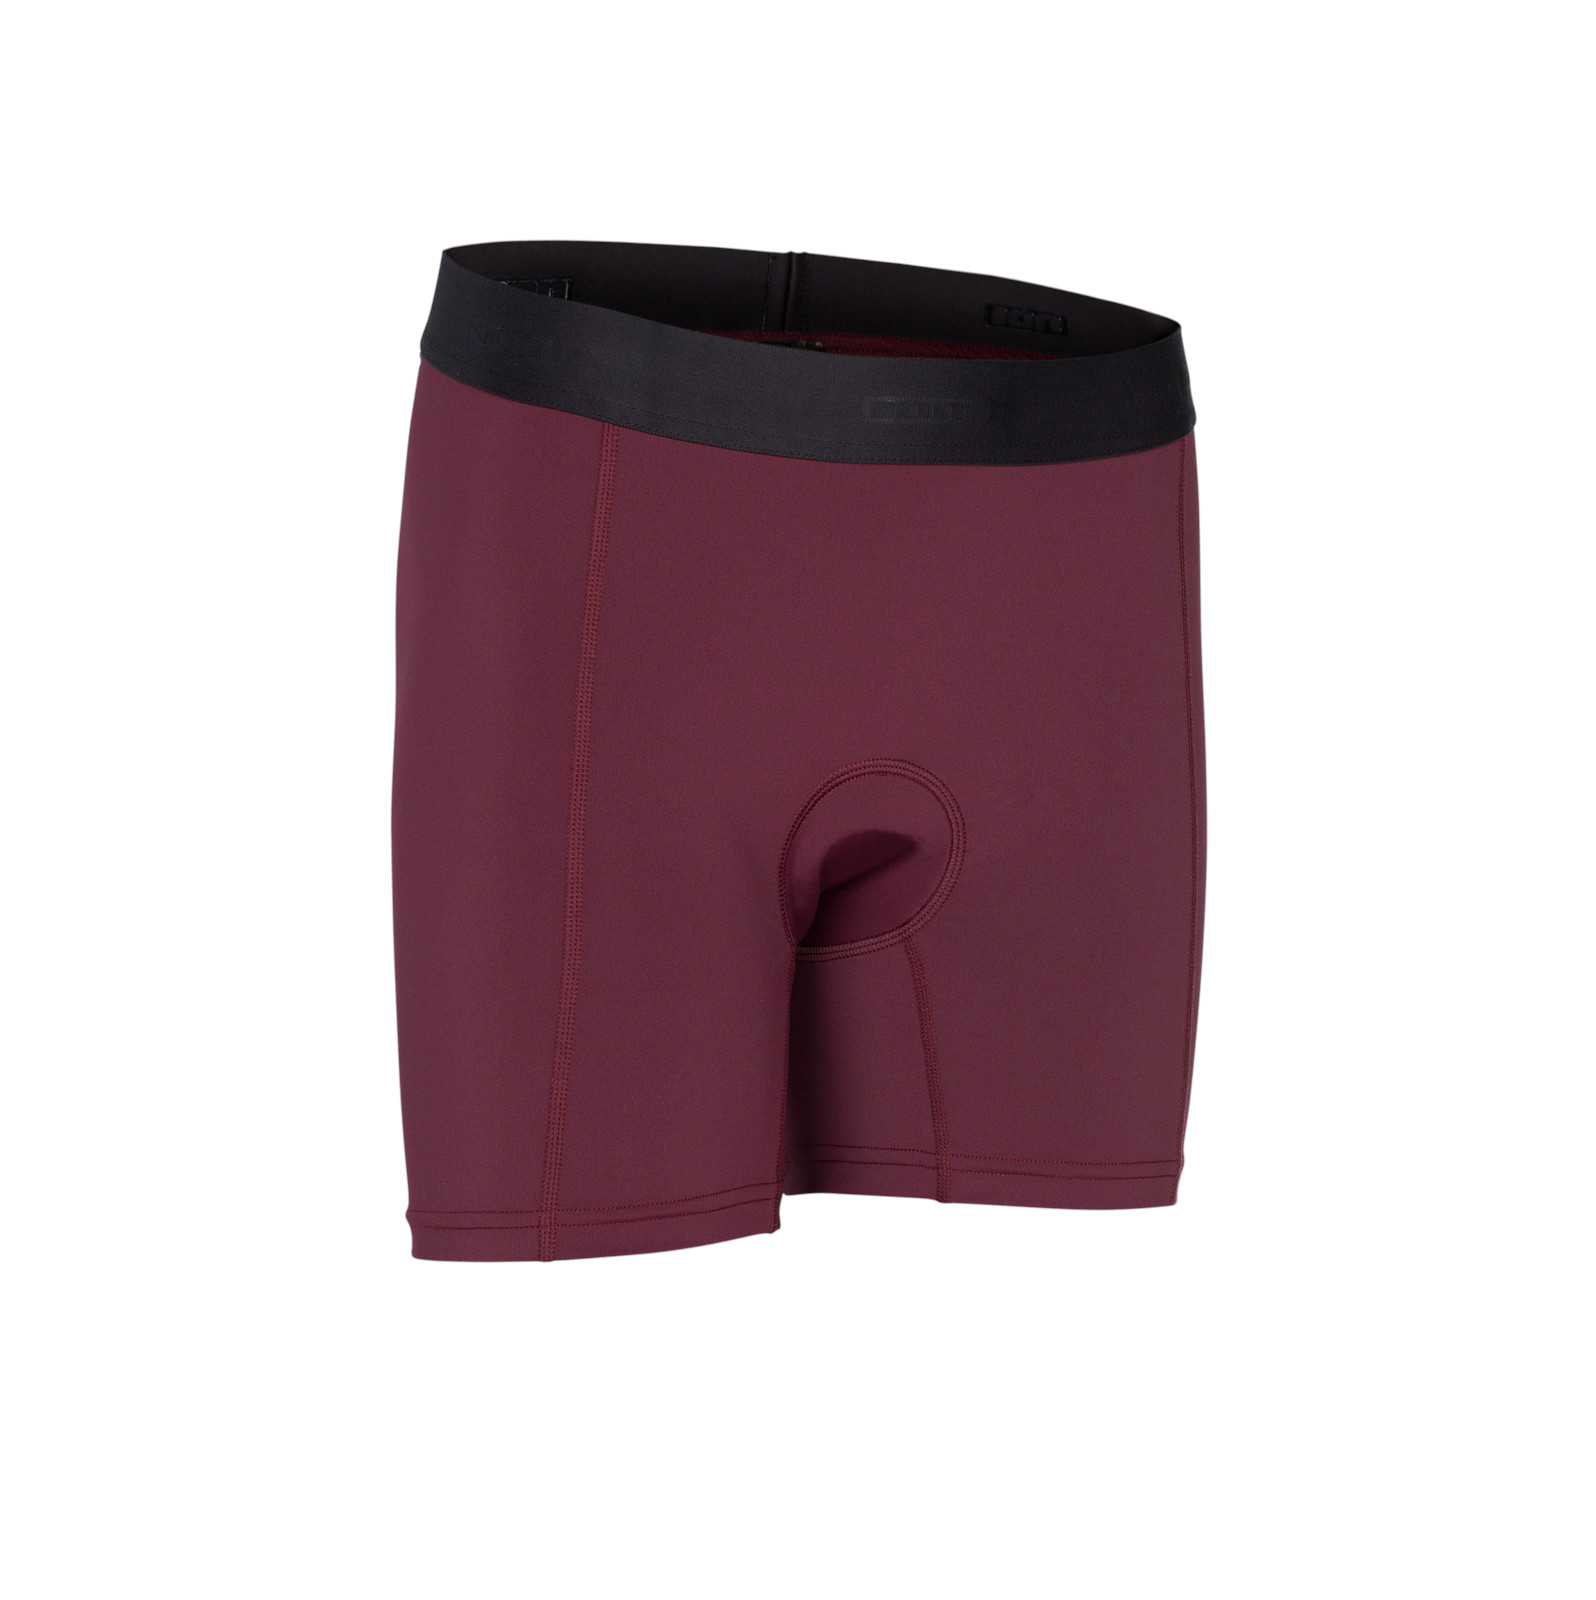 ION Women's Short In-Short